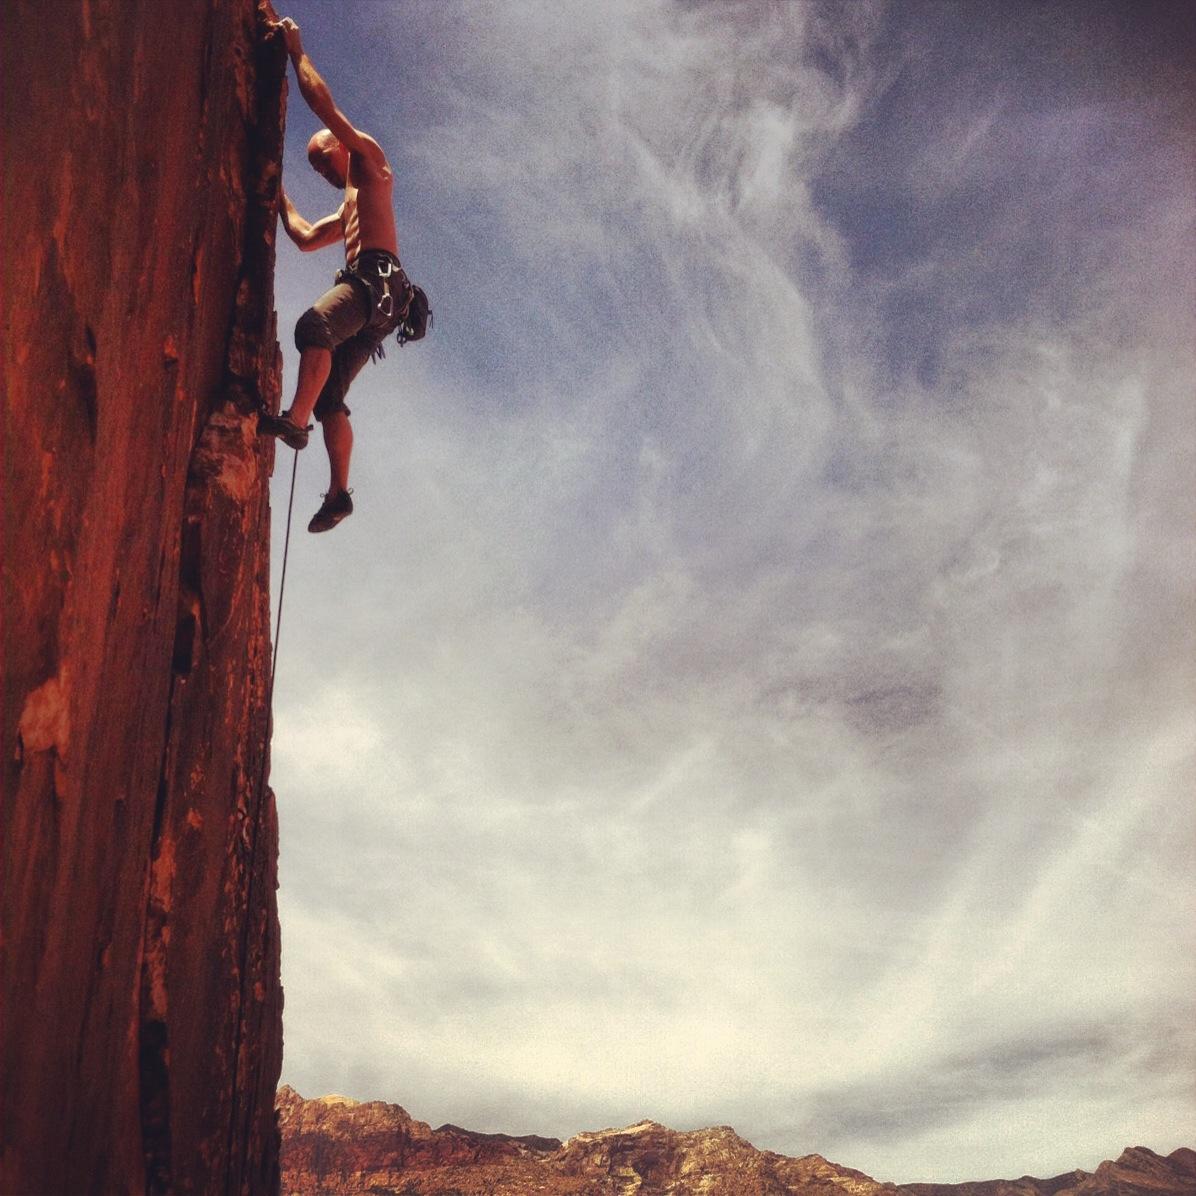 Foap-Just_climbing___